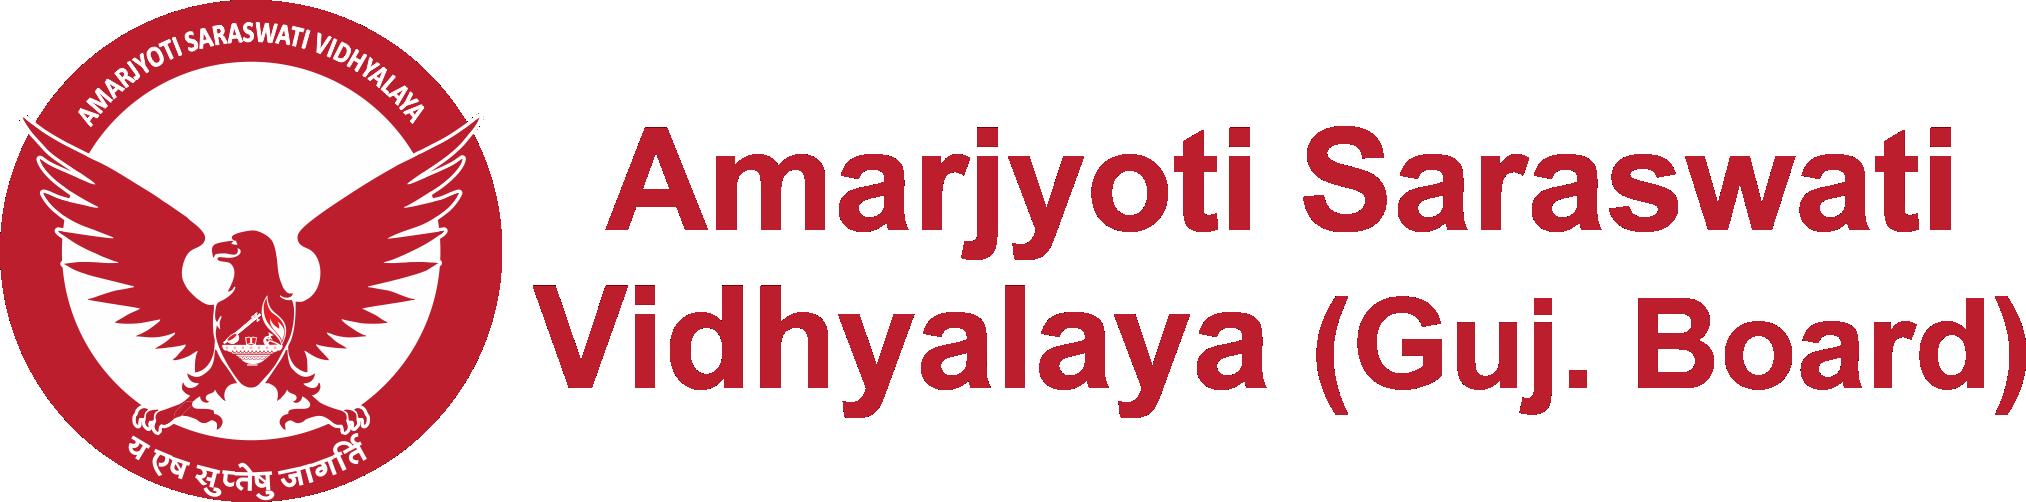 Amar Jyoti Saraswati Vidyalaya